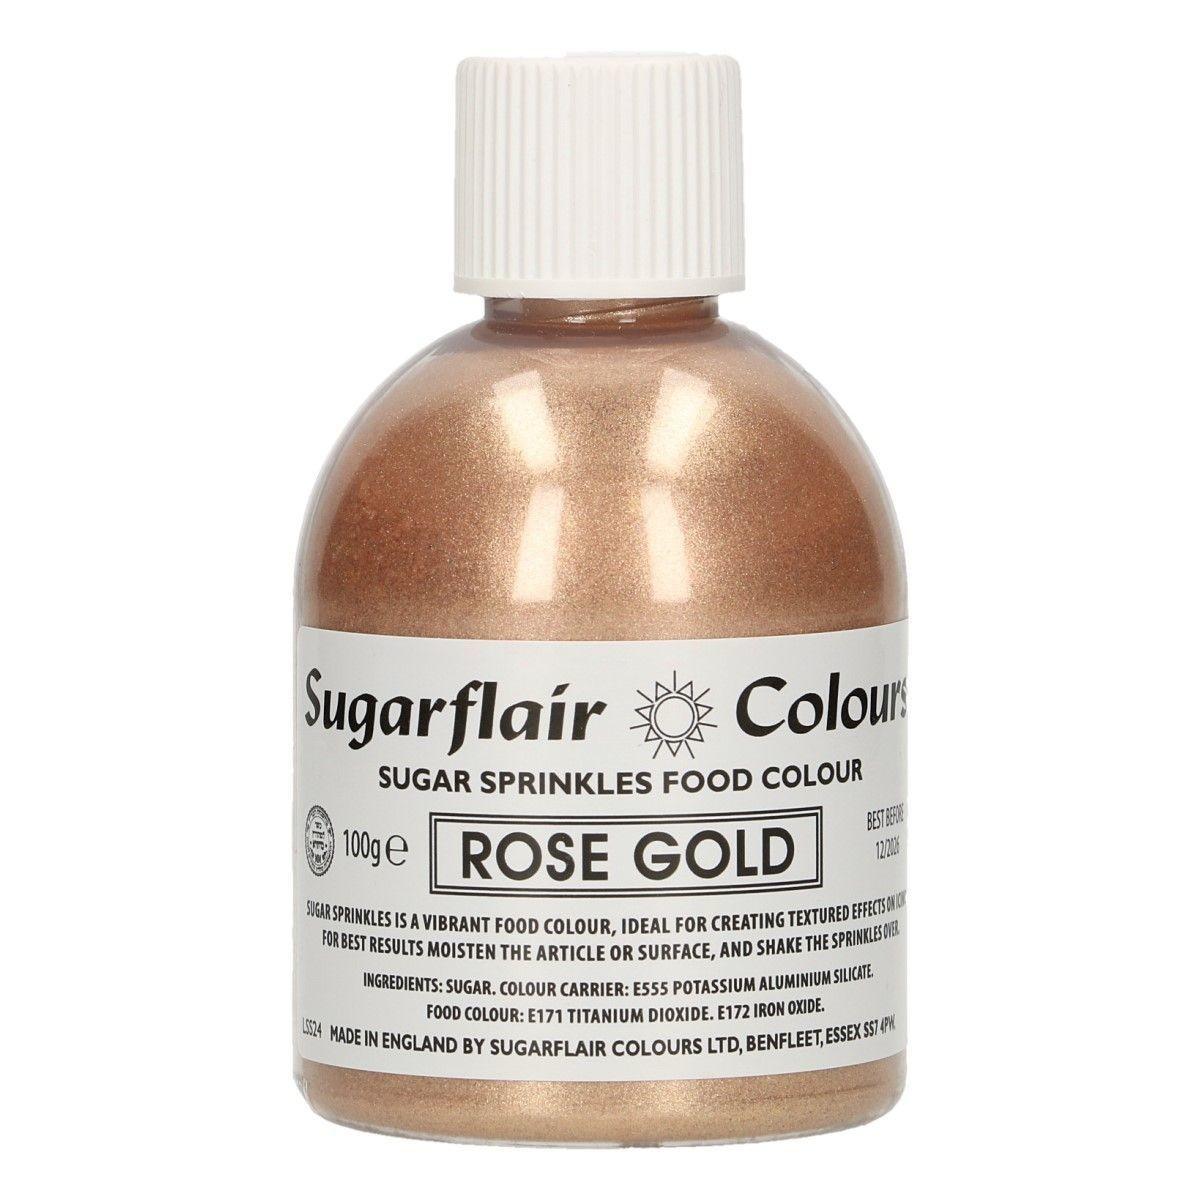 Sugarflair -Sparkling Sugar Sprinkles -ROSE GOLD 100g